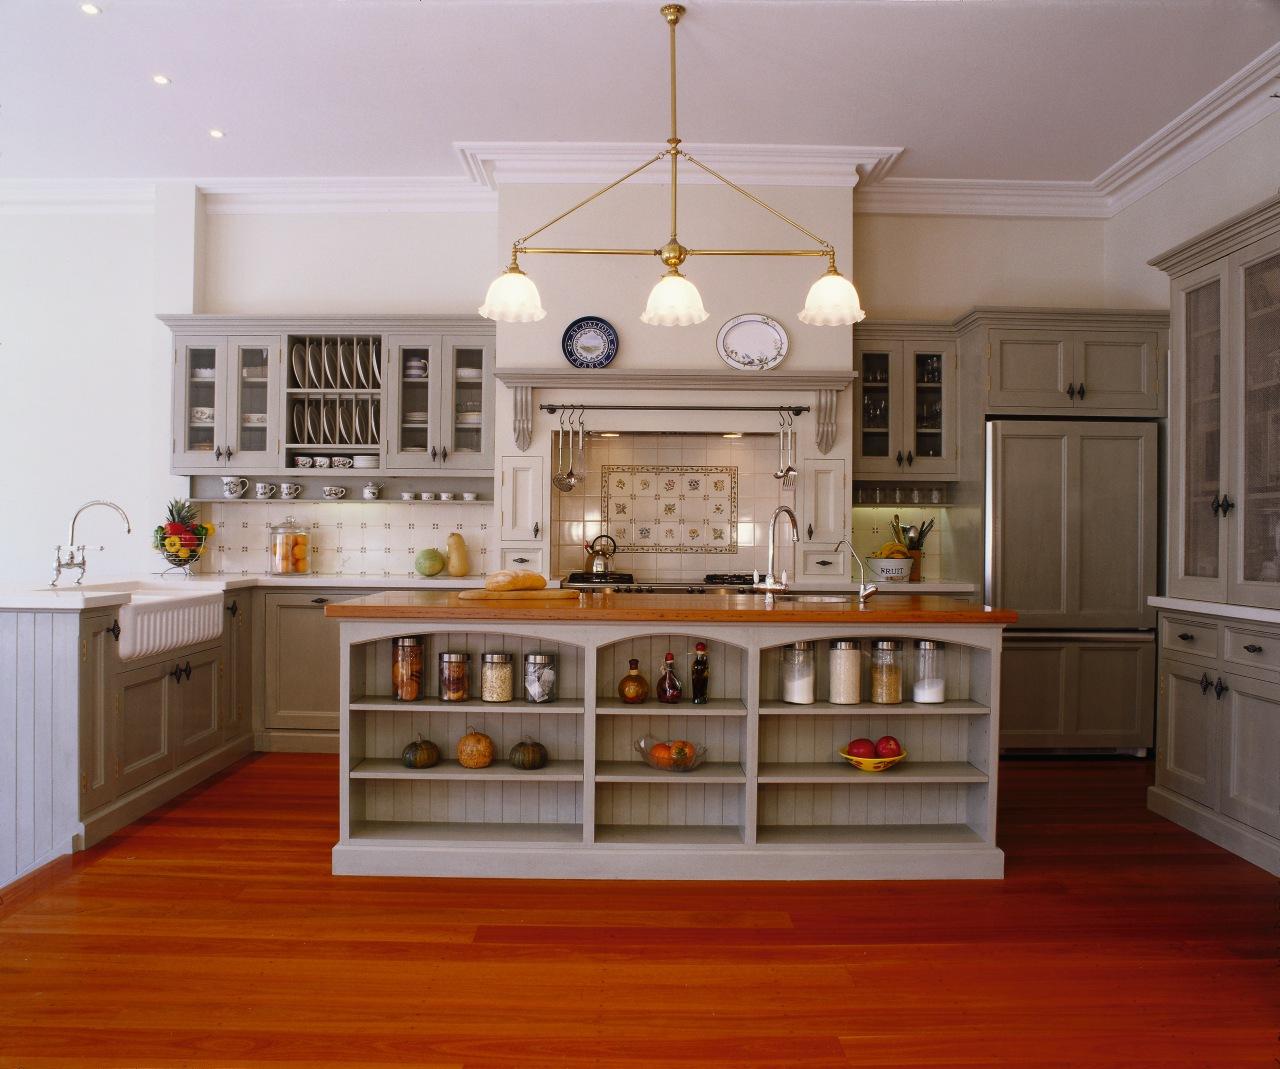 view of this custom designed one off kitchen cabinetry, countertop, cuisine classique, floor, flooring, furniture, hardwood, home, interior design, kitchen, room, wood flooring, gray, brown